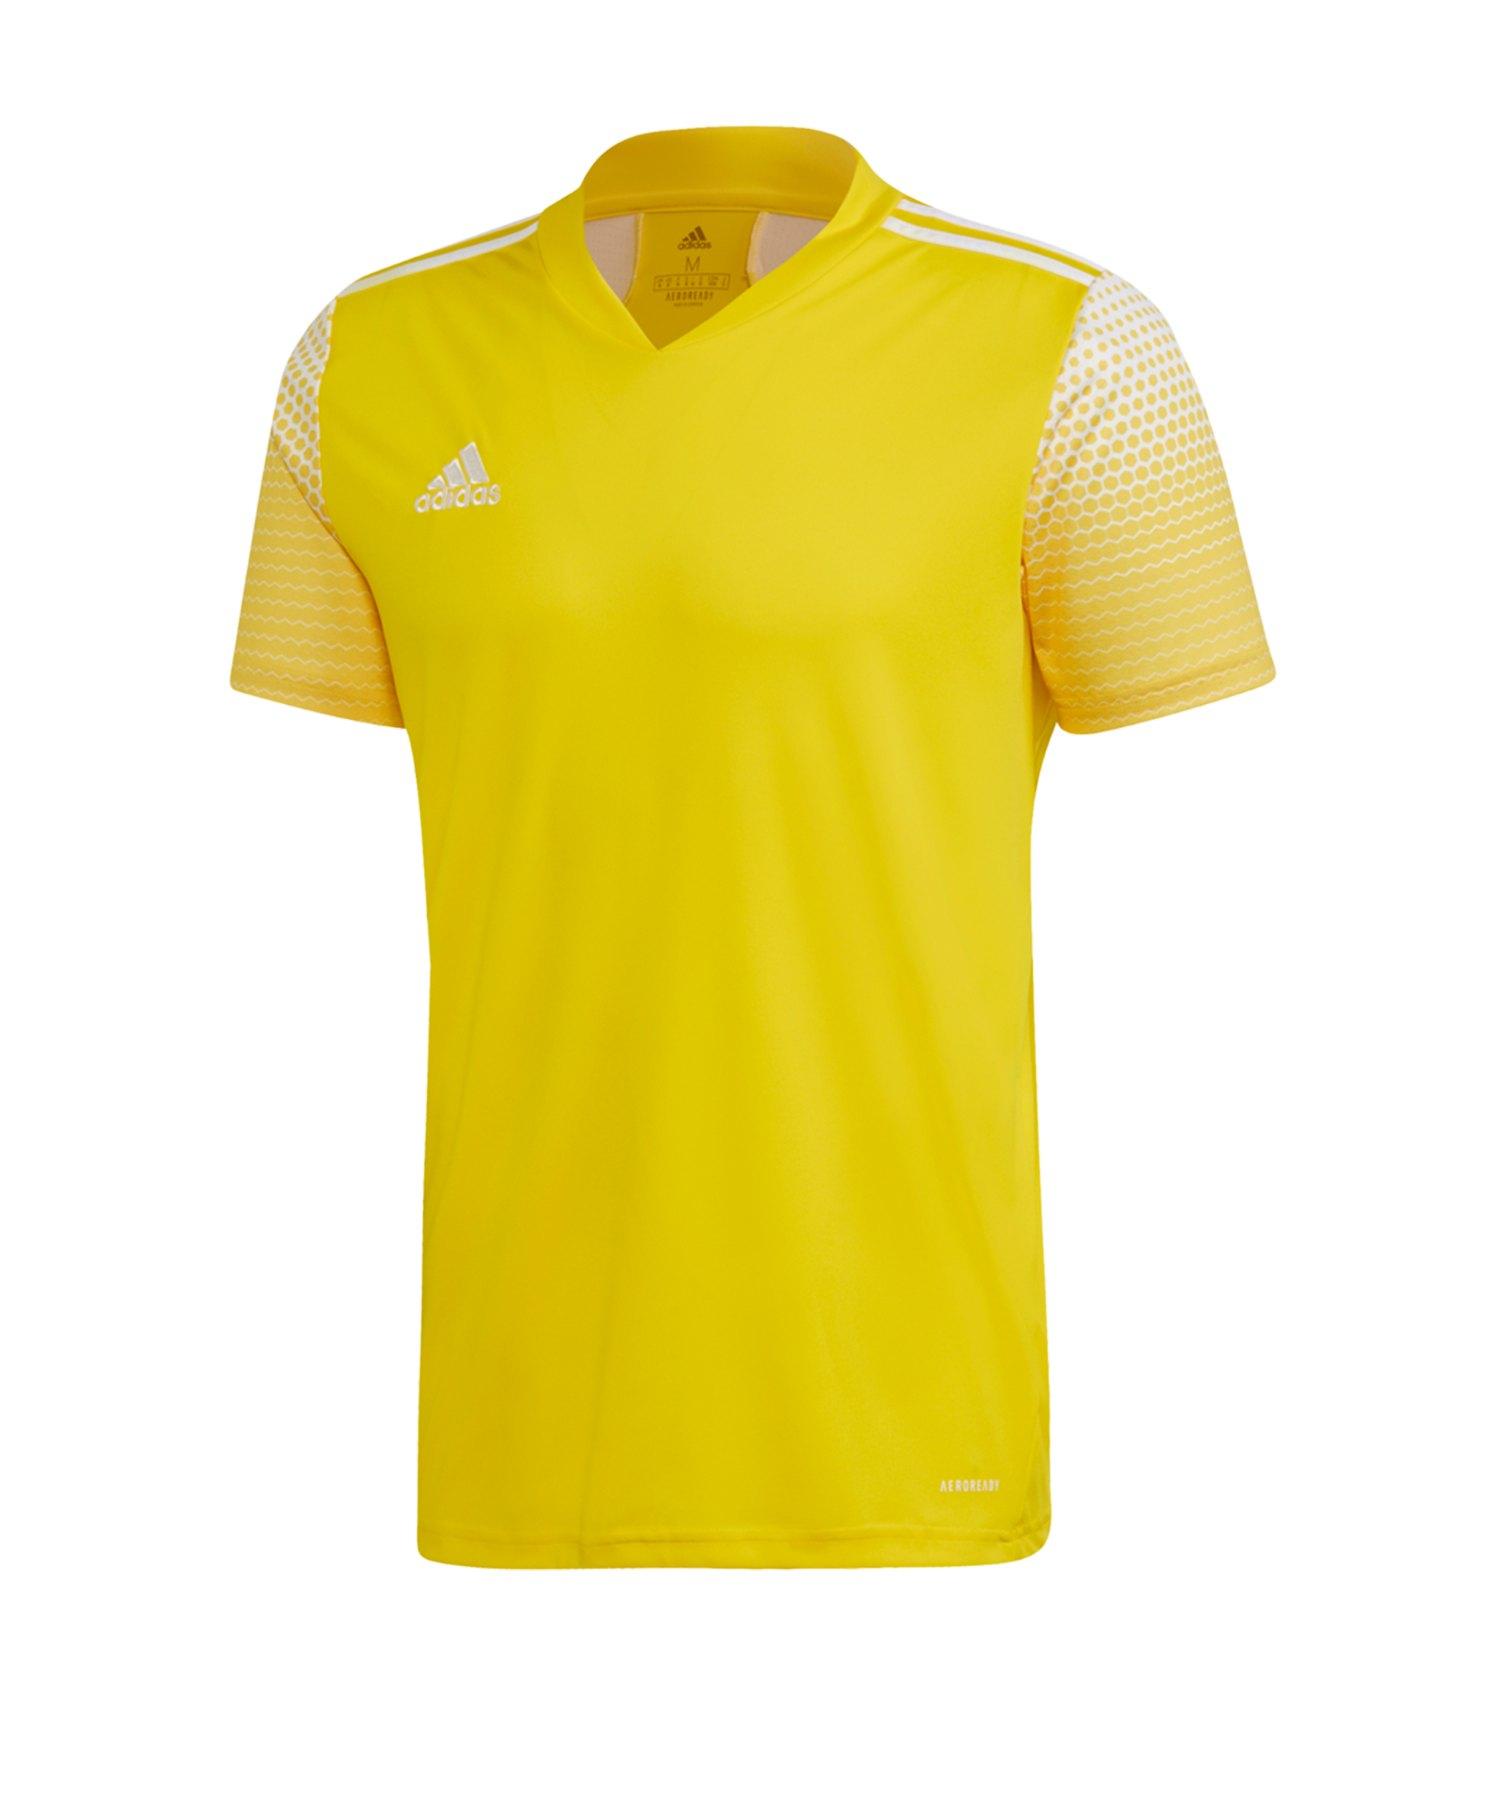 adidas Regista 20 Trikot kurzarm Gelb Weiss - gelb